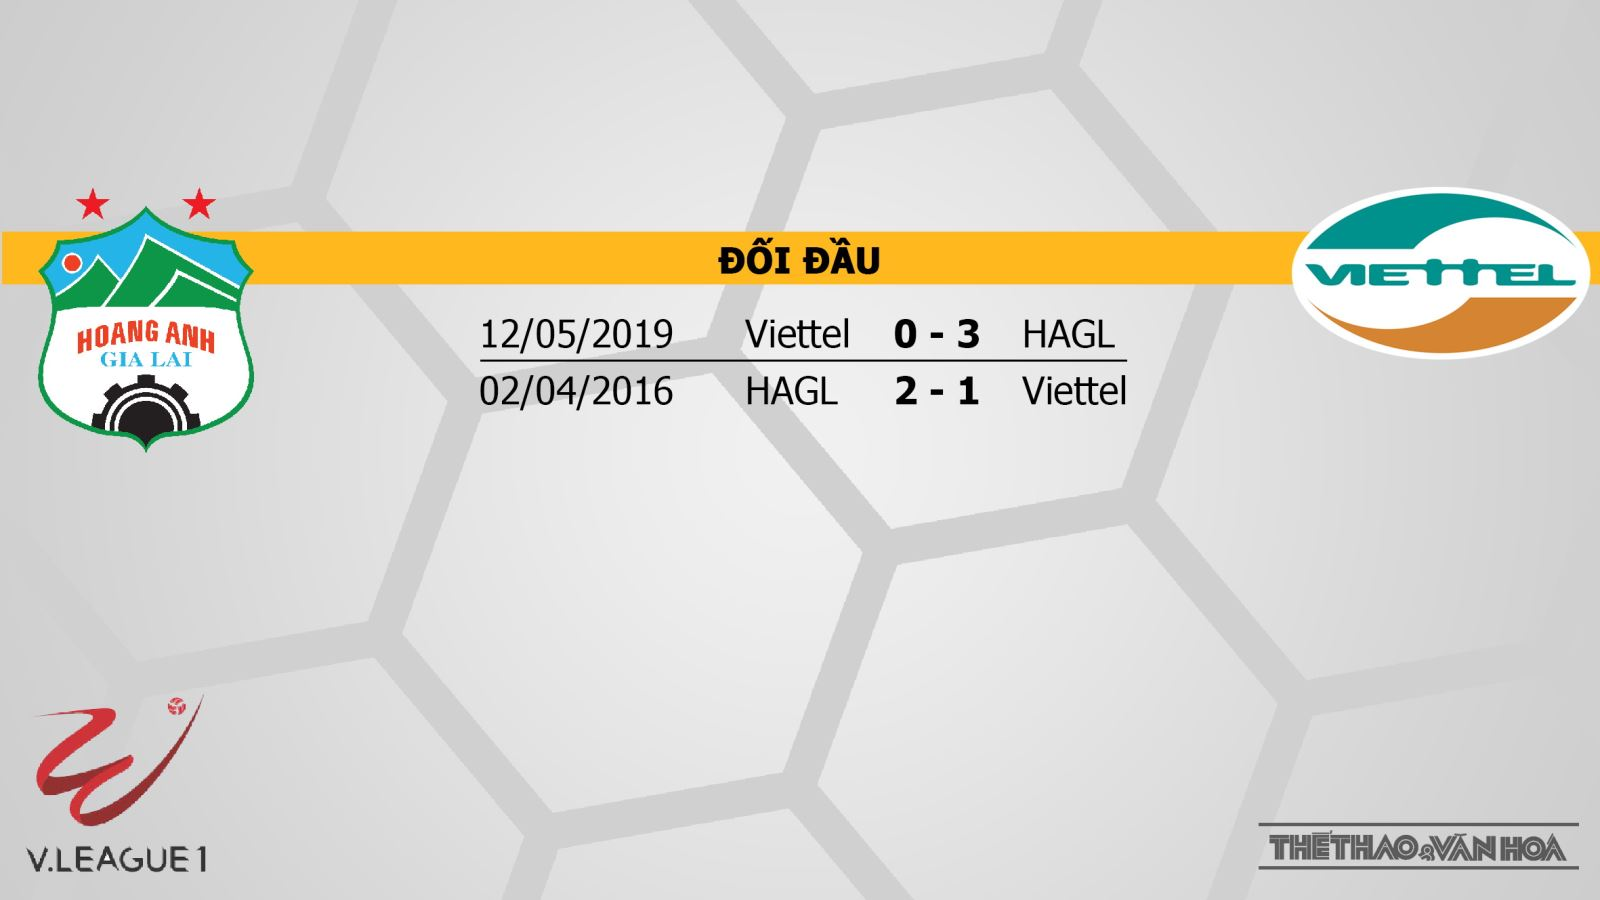 HAGL vsViettel, HAGL, Viettel, trực tiếp HAGL vsViettel, nhận định HAGL vsViettel, soi kèo HAGL vsViettel